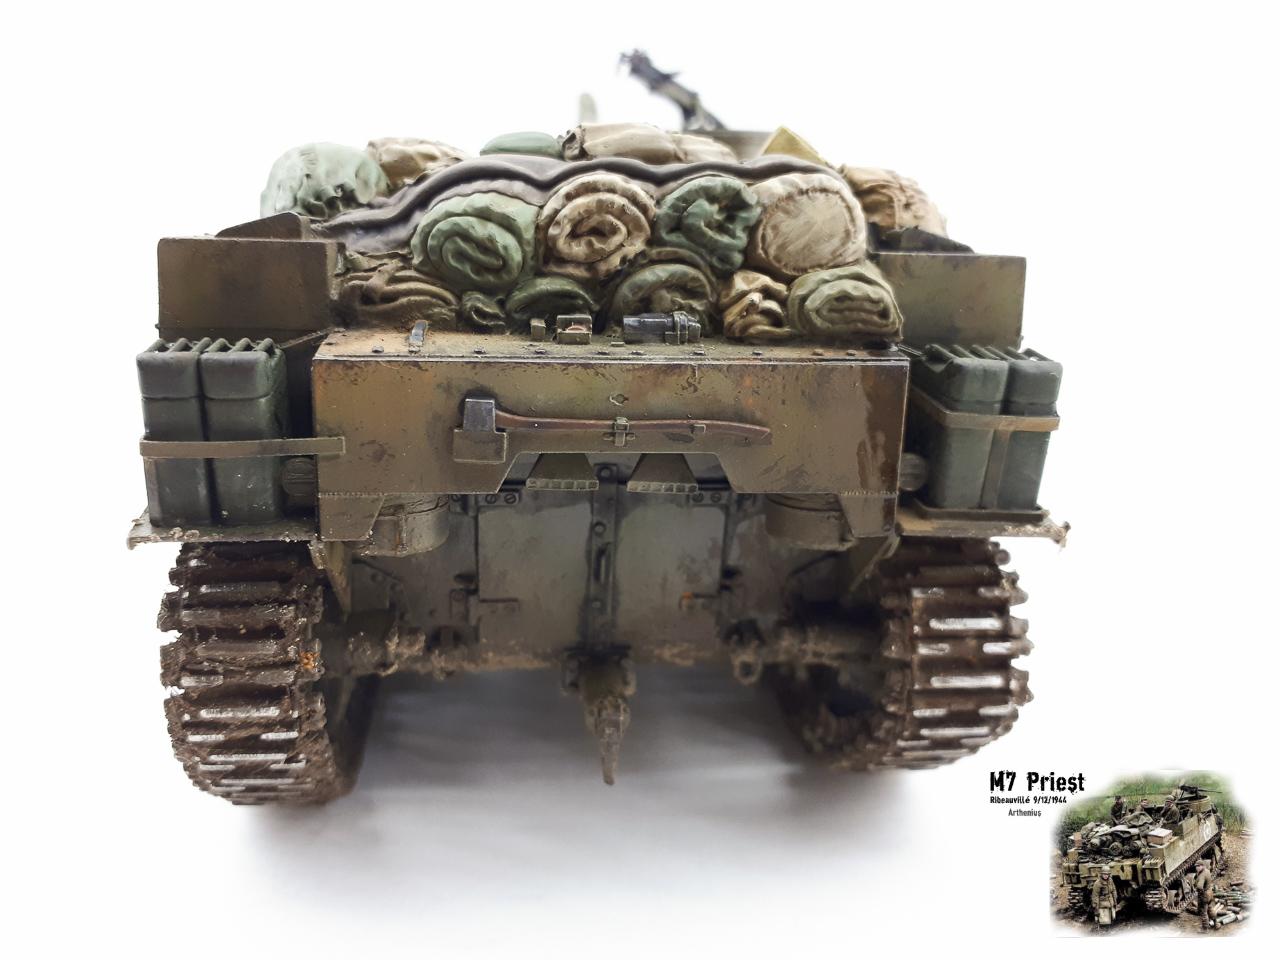 M7 Priest Ribeauvillé 9/12/1944 - Page 3 2018-117